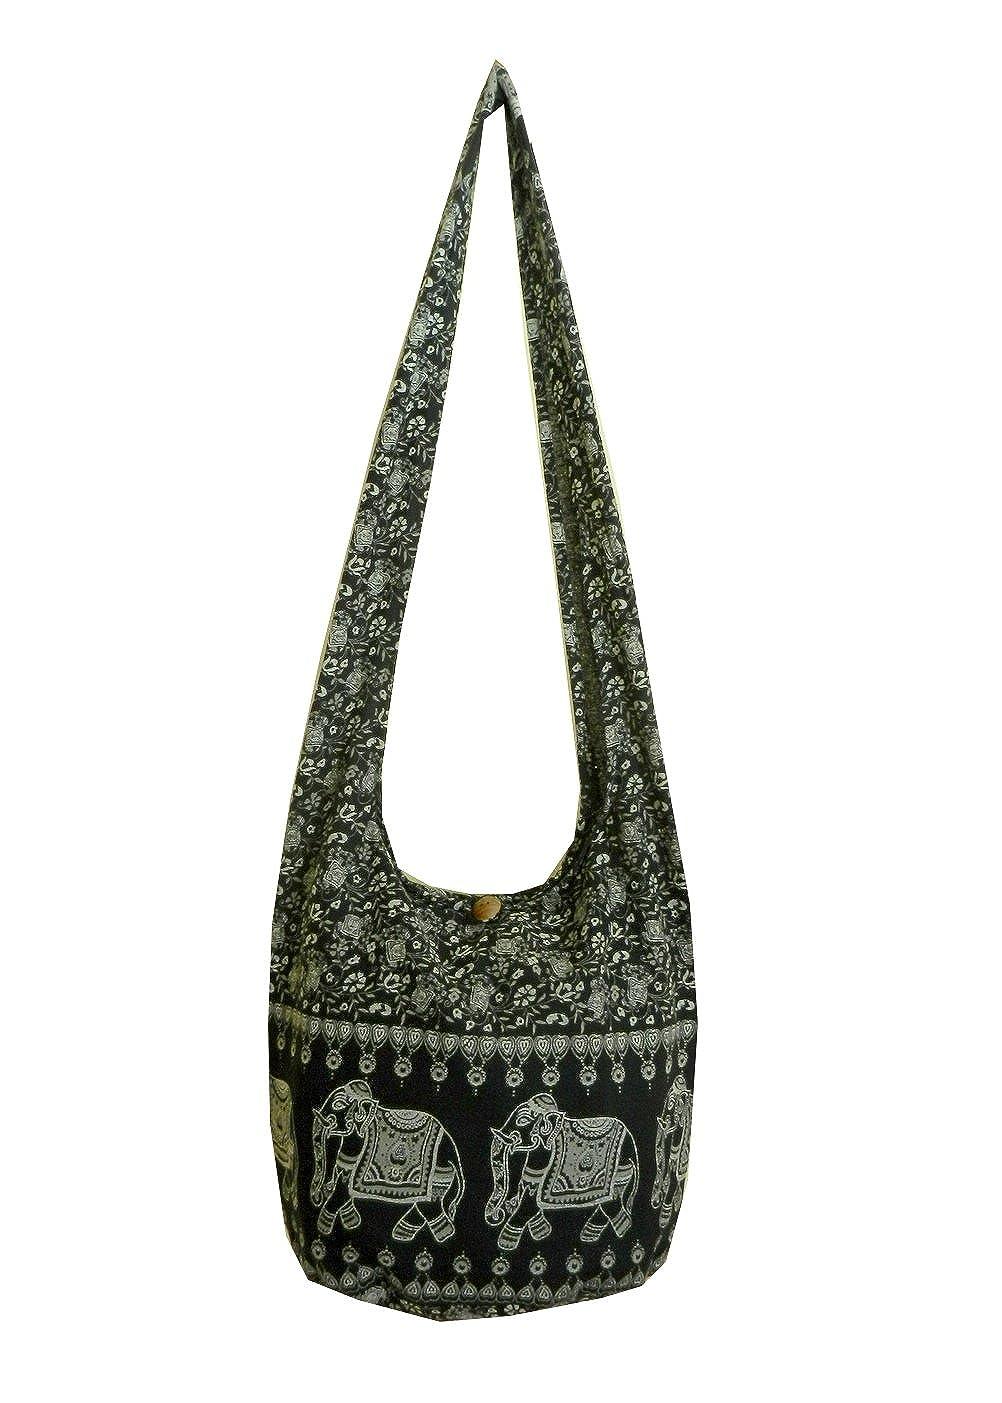 425cc6d406048 Elephant Sling Crossbody Shoulder Bag Purse Hippie Hobo Thai Cotton Gypsy  Bohemian Large Black NE6  Shoes